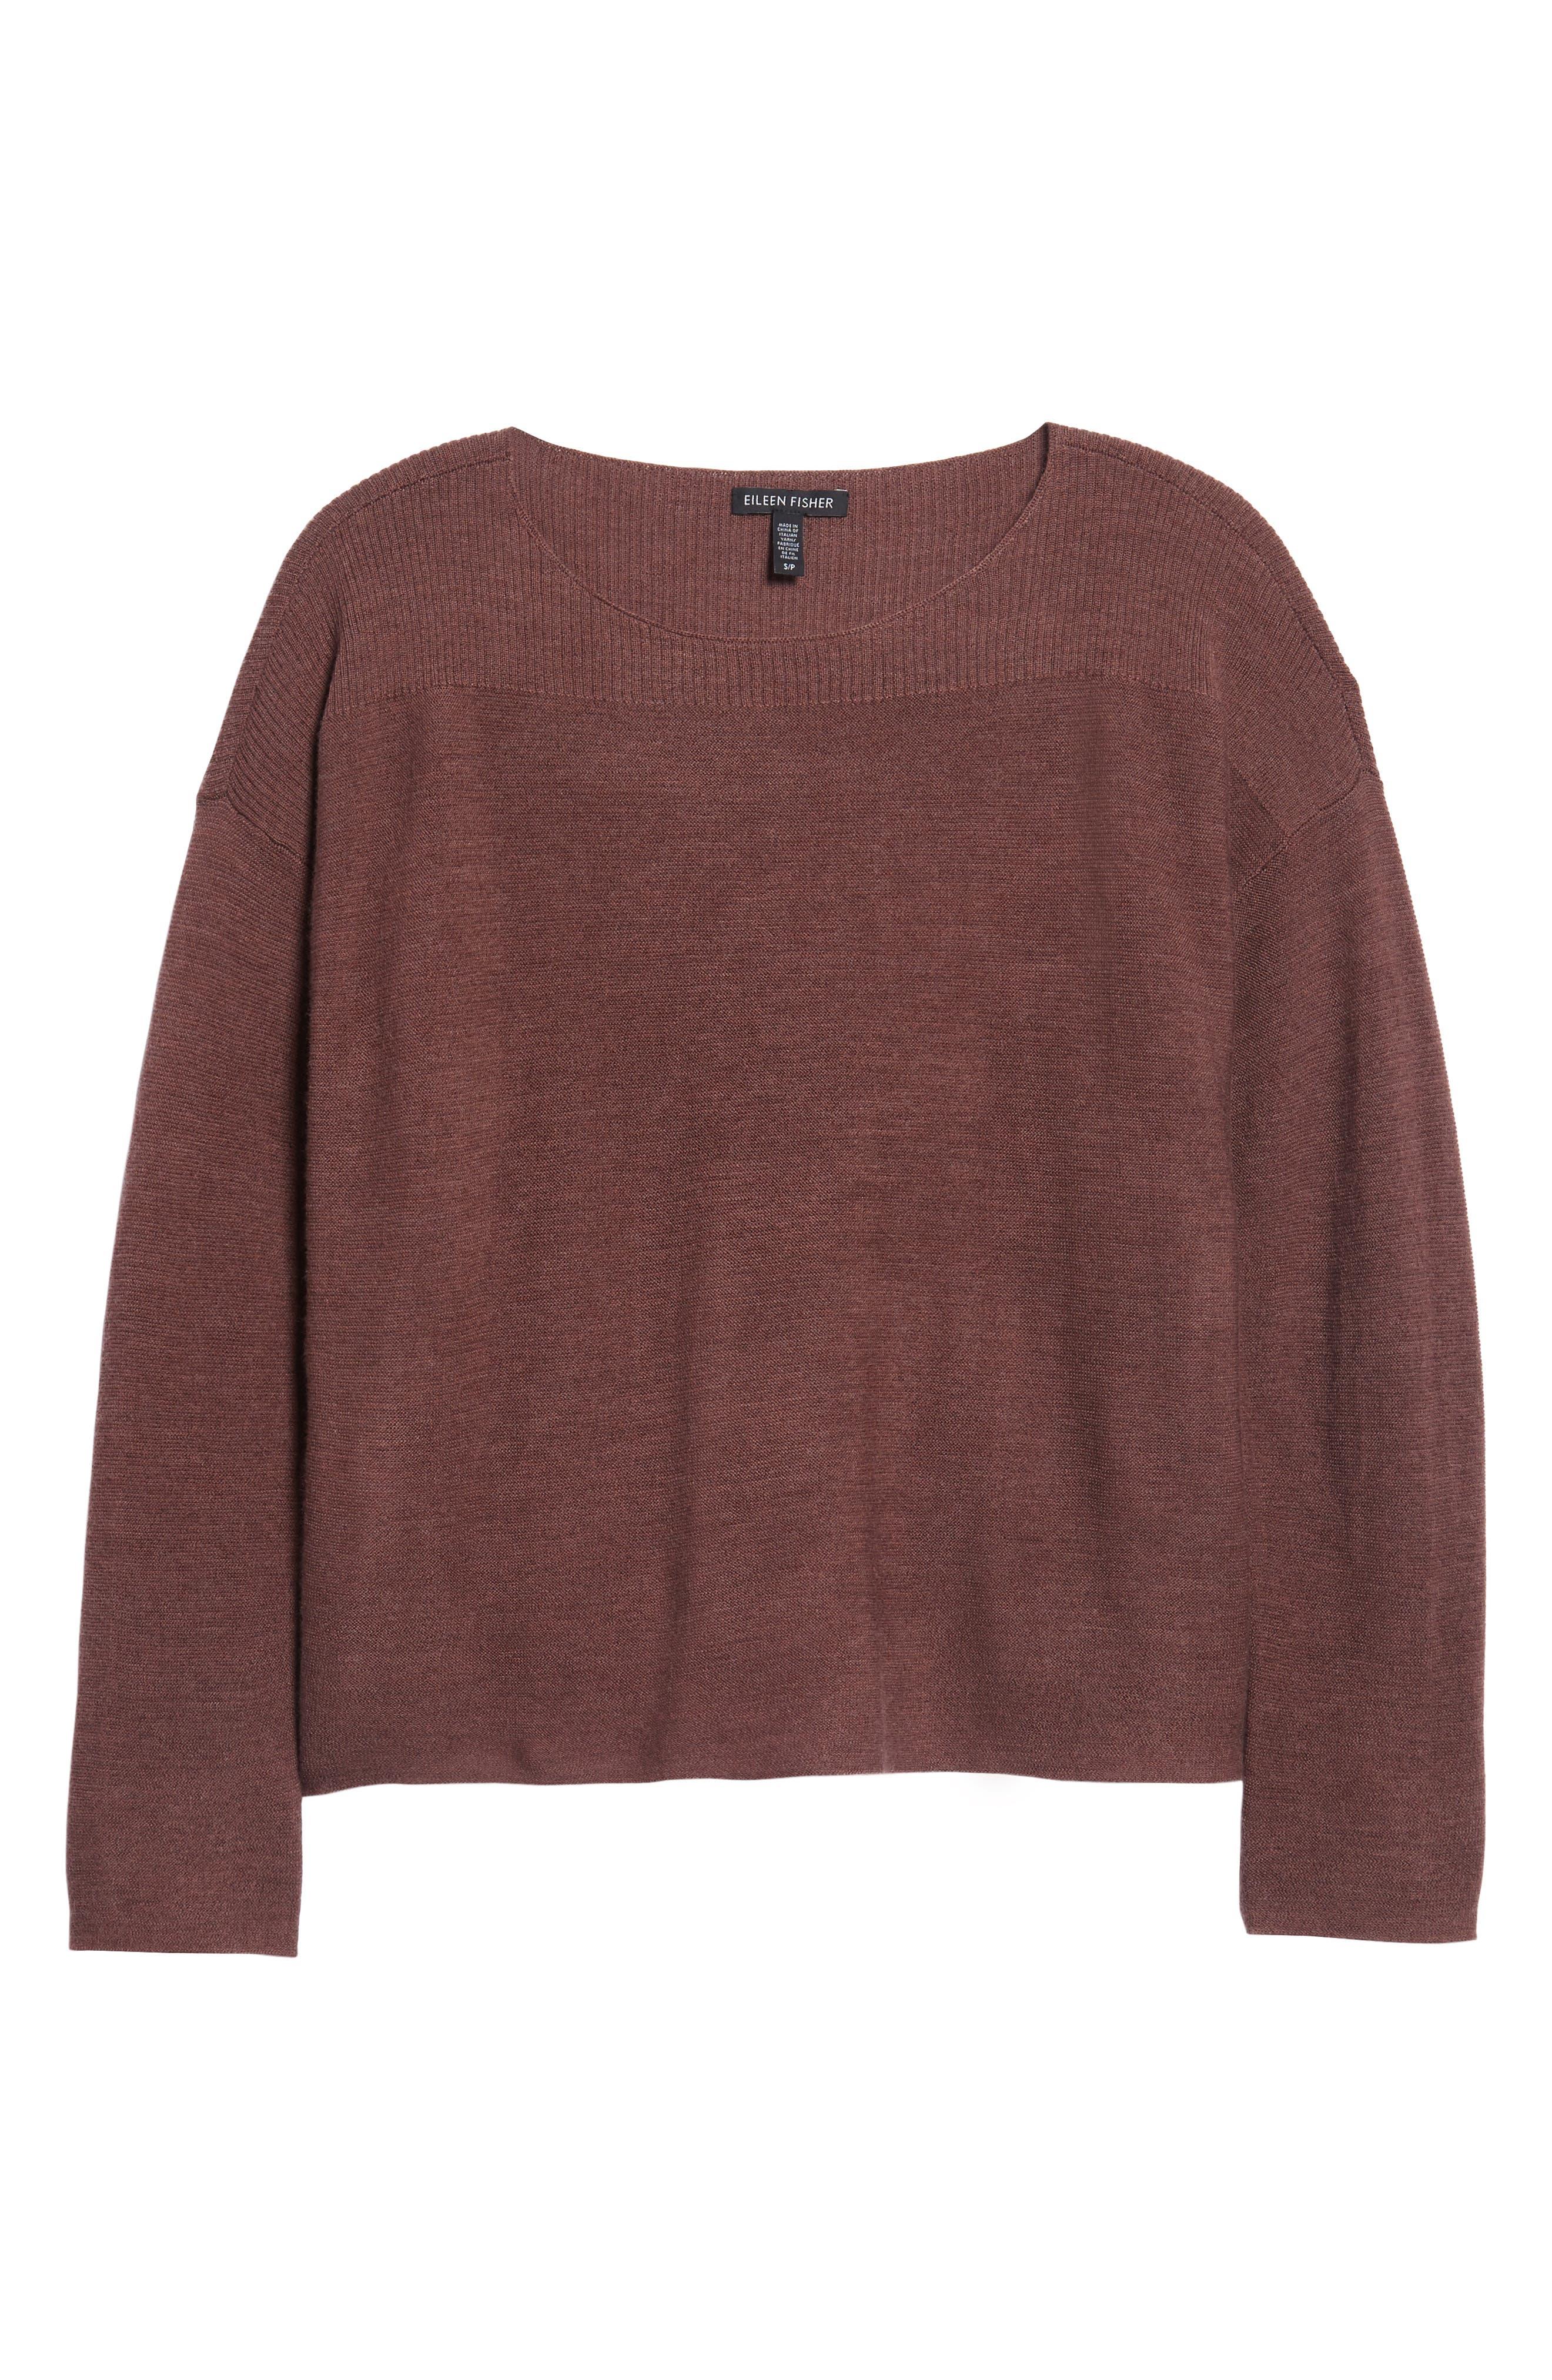 Mix Stitch Merino Bateau Neck Sweater,                         Main,                         color, Mahogany